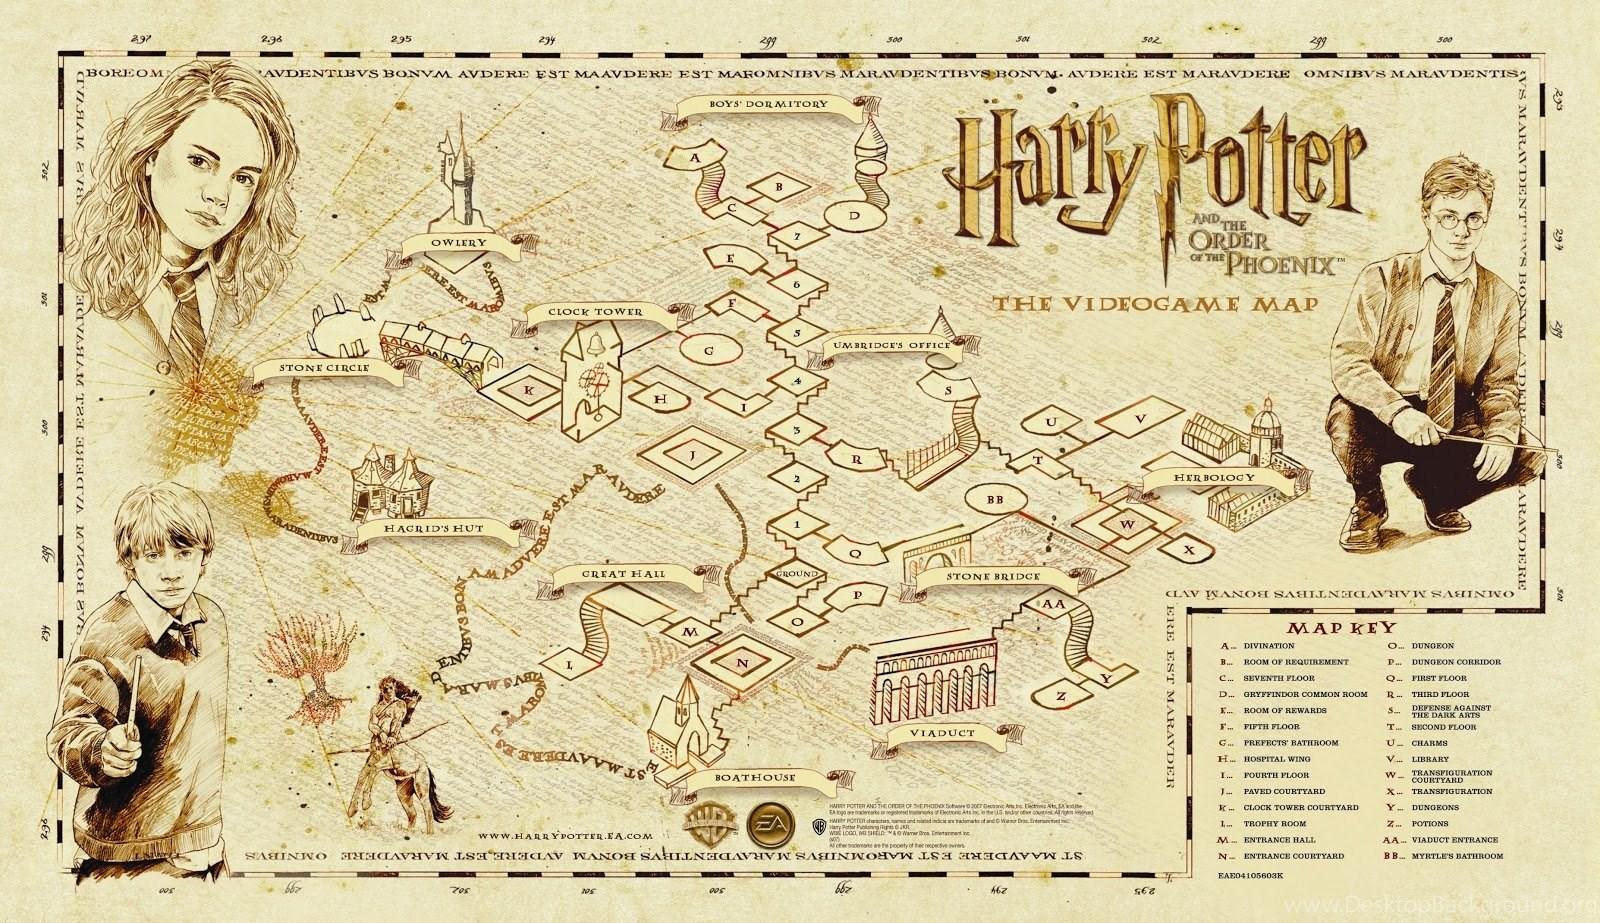 Great Wallpaper Harry Potter Map - 987185_nerdovore-fantasy-world-maps-harry-potter_1600x923_h  Graphic_485685.jpg